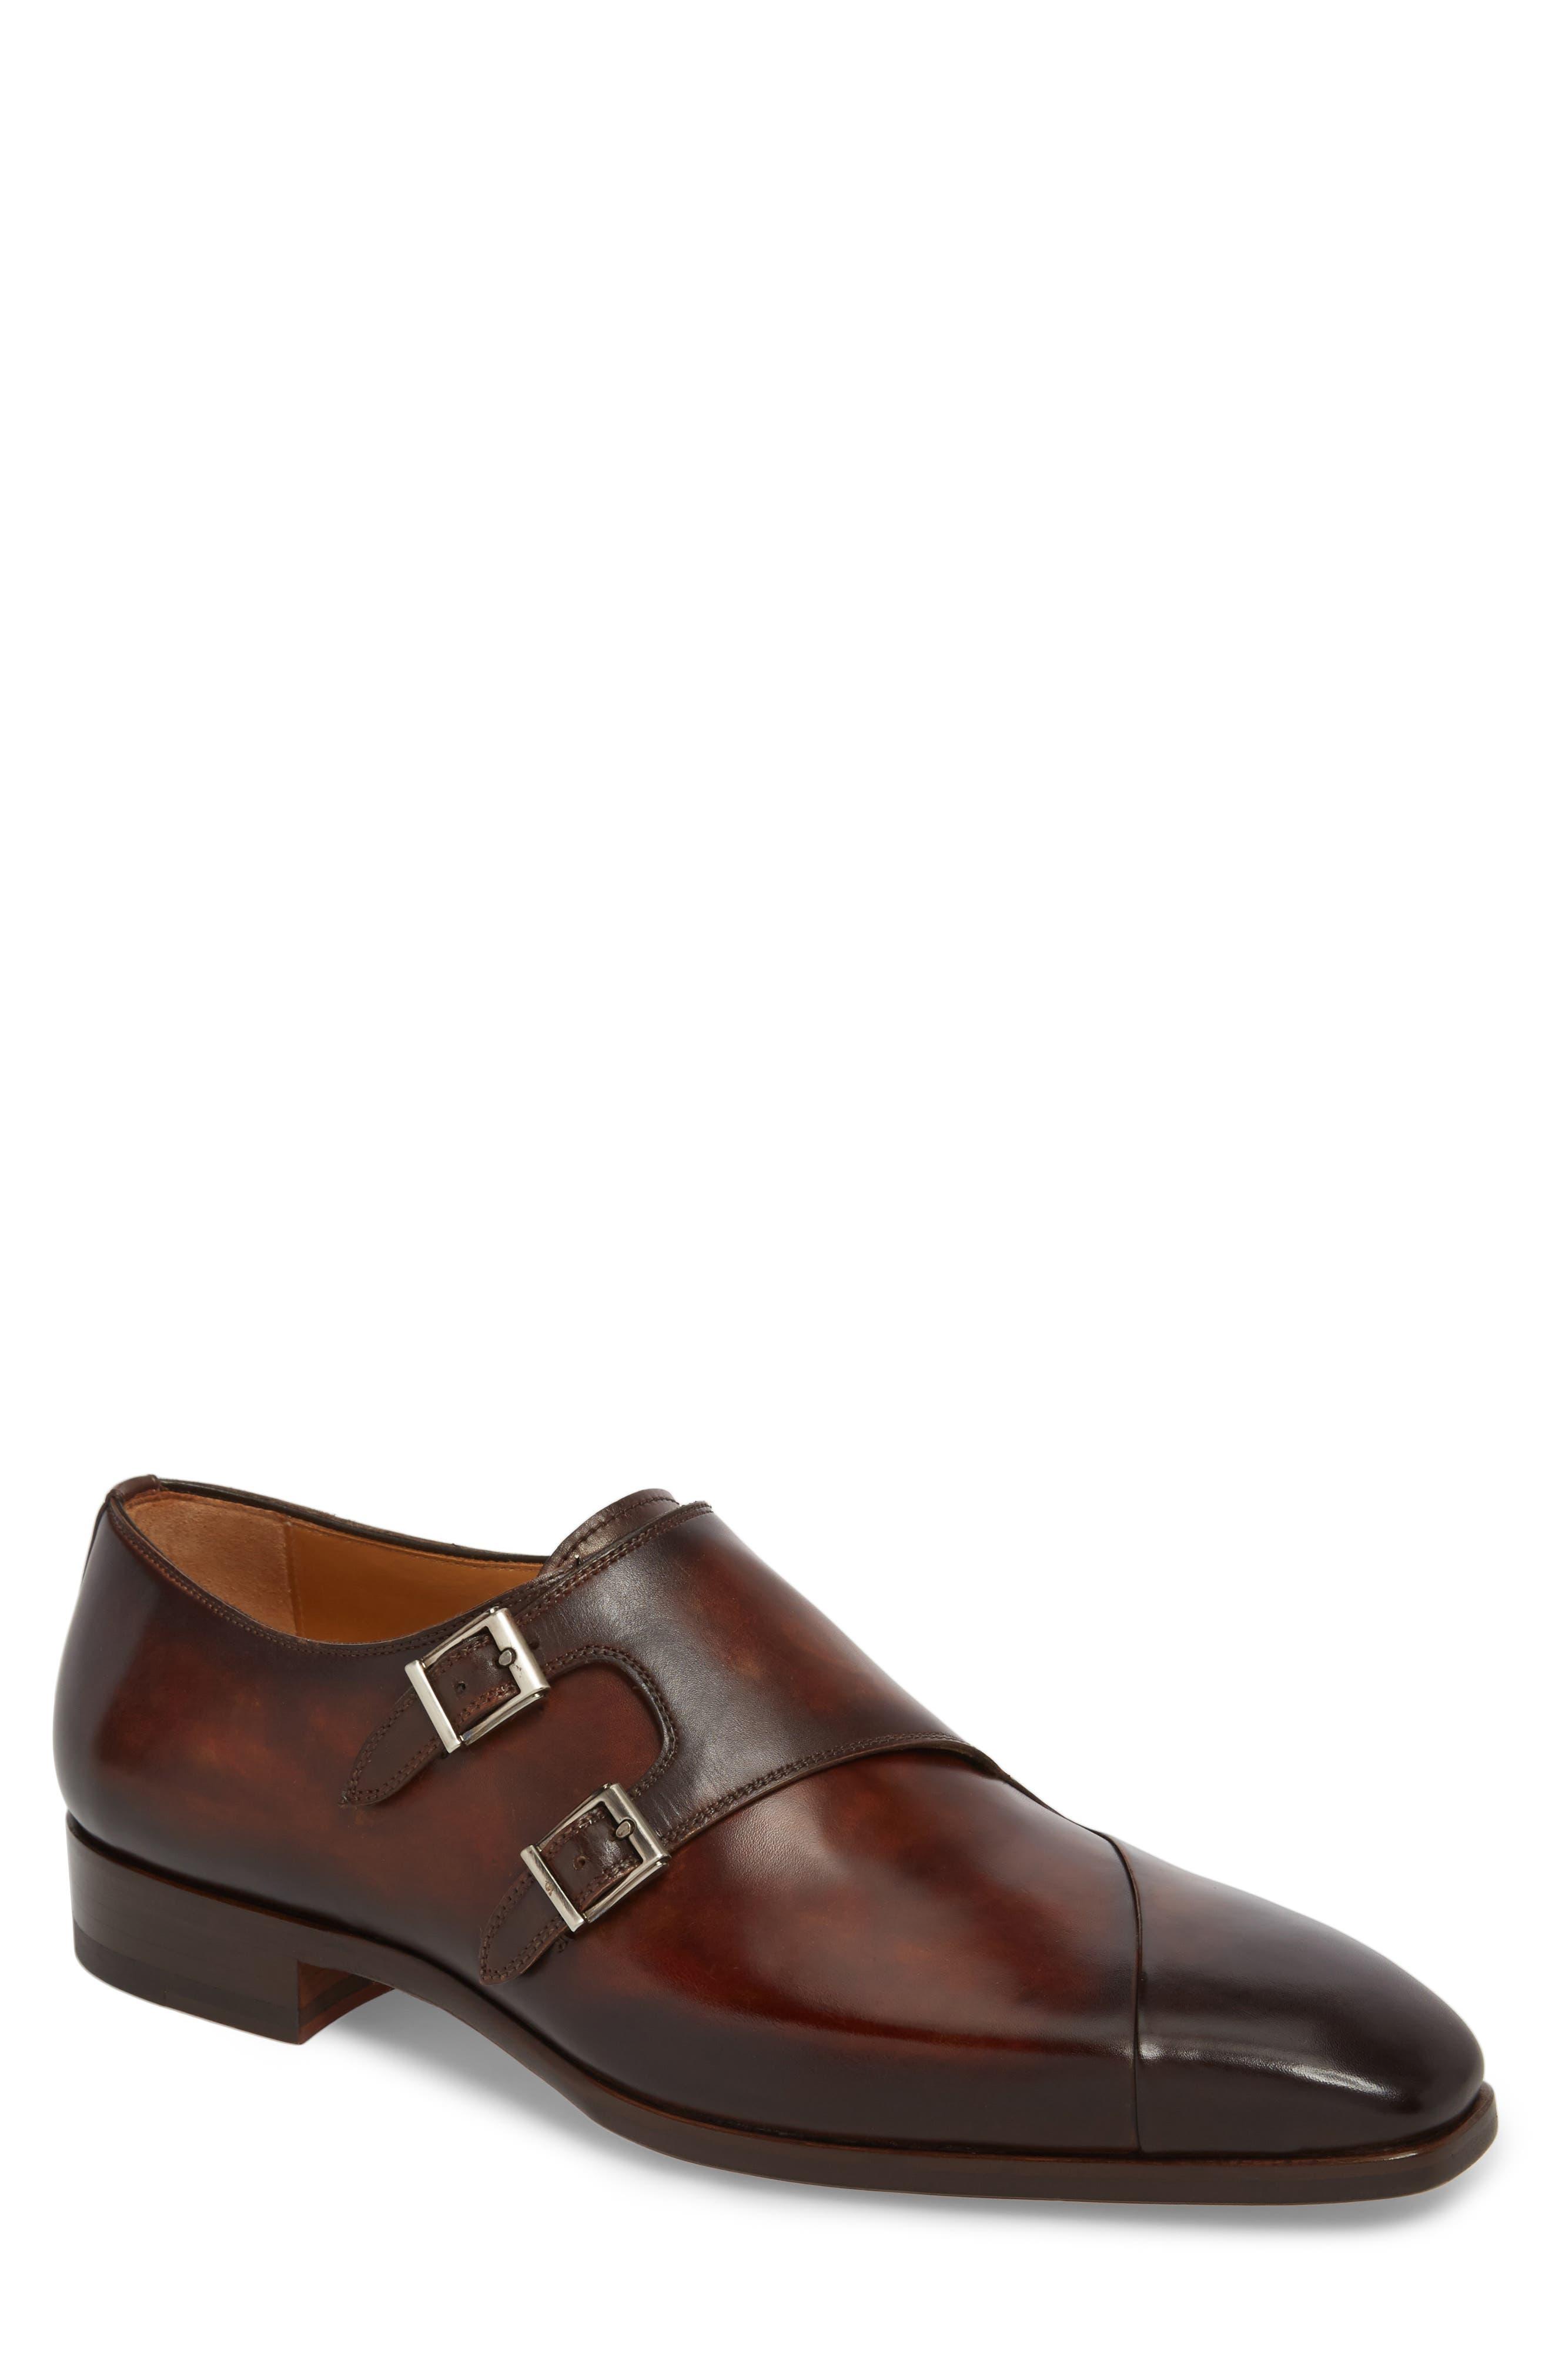 Hafiz Double Strap Monk Shoe,                             Main thumbnail 1, color,                             Tabaco Leather